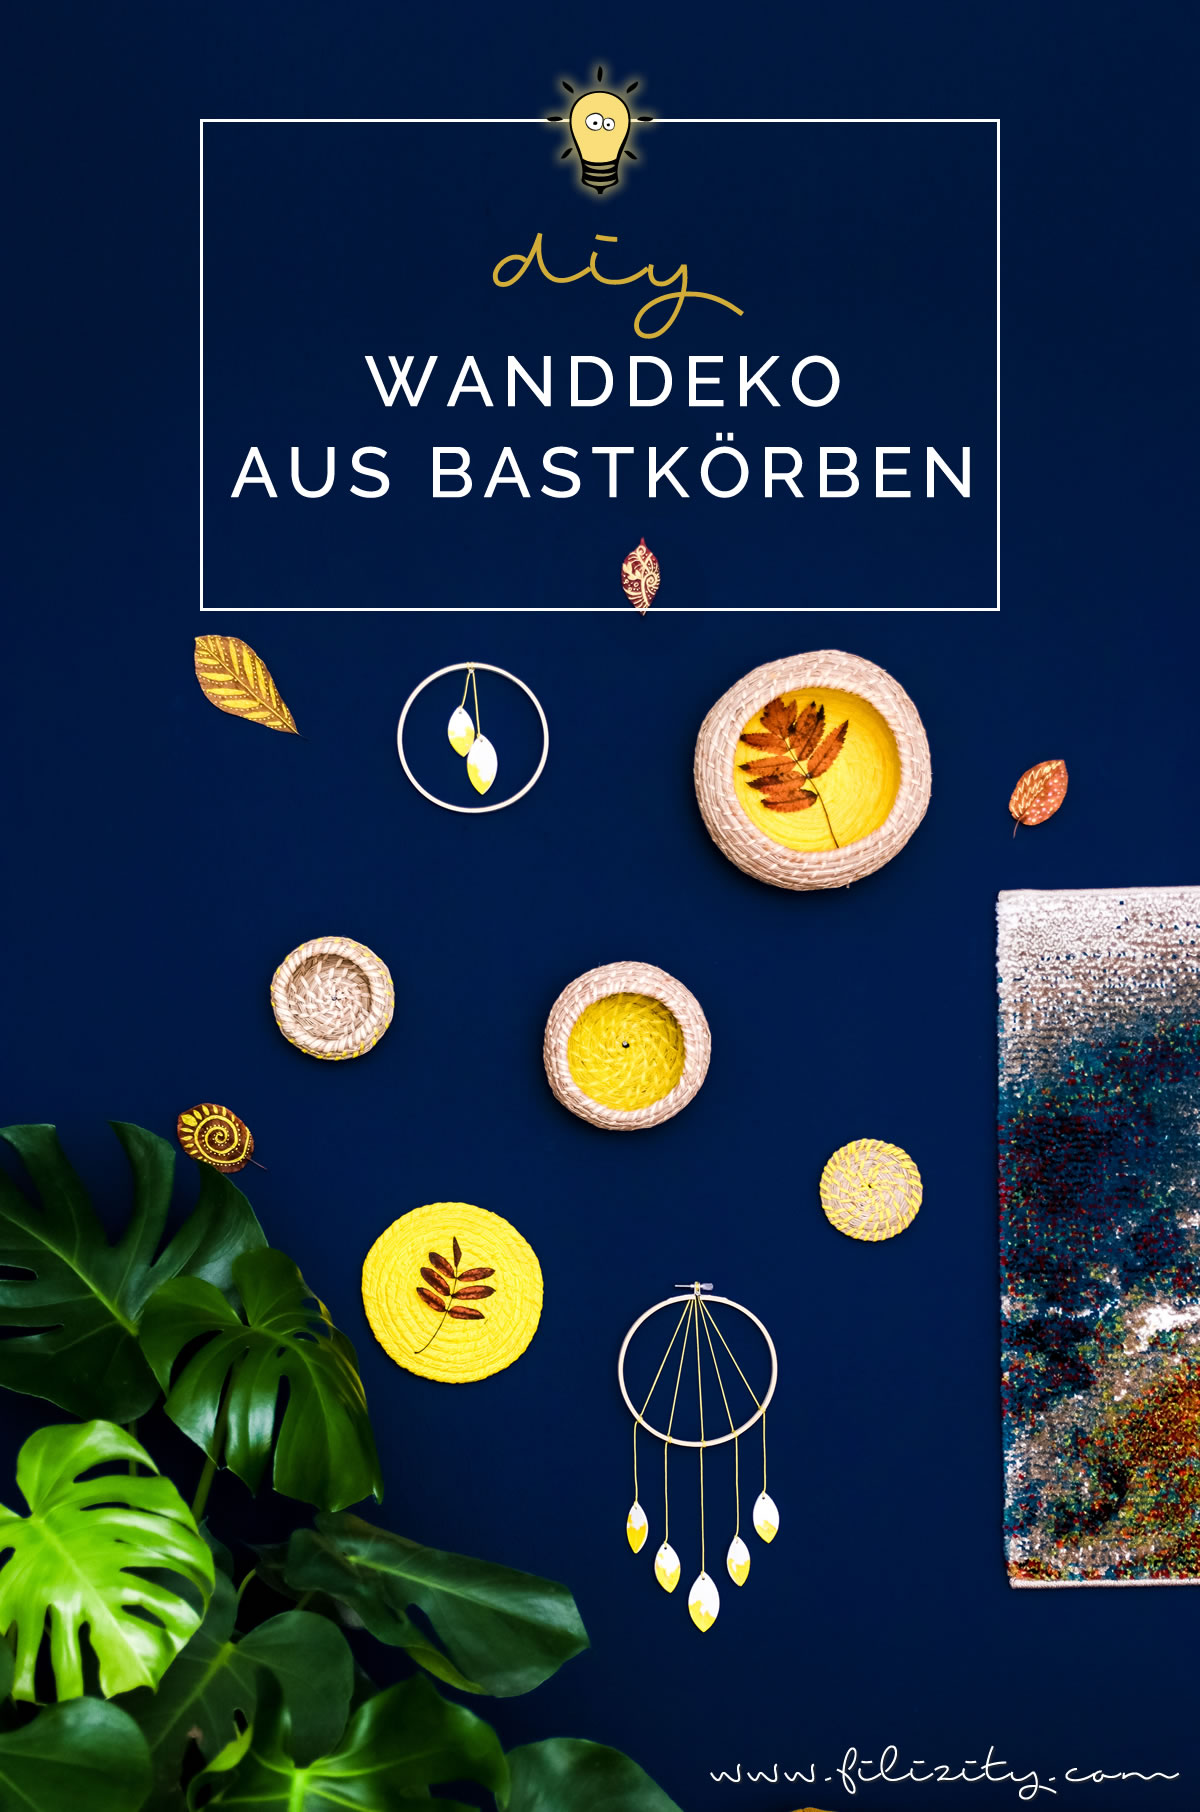 Ikea-Hack: DIY Wanddeko aus Bast-Körben basteln | Filizity.com | DIY-Blog aus dem Rheinland #herbst #deko #upcycling #ikeahack